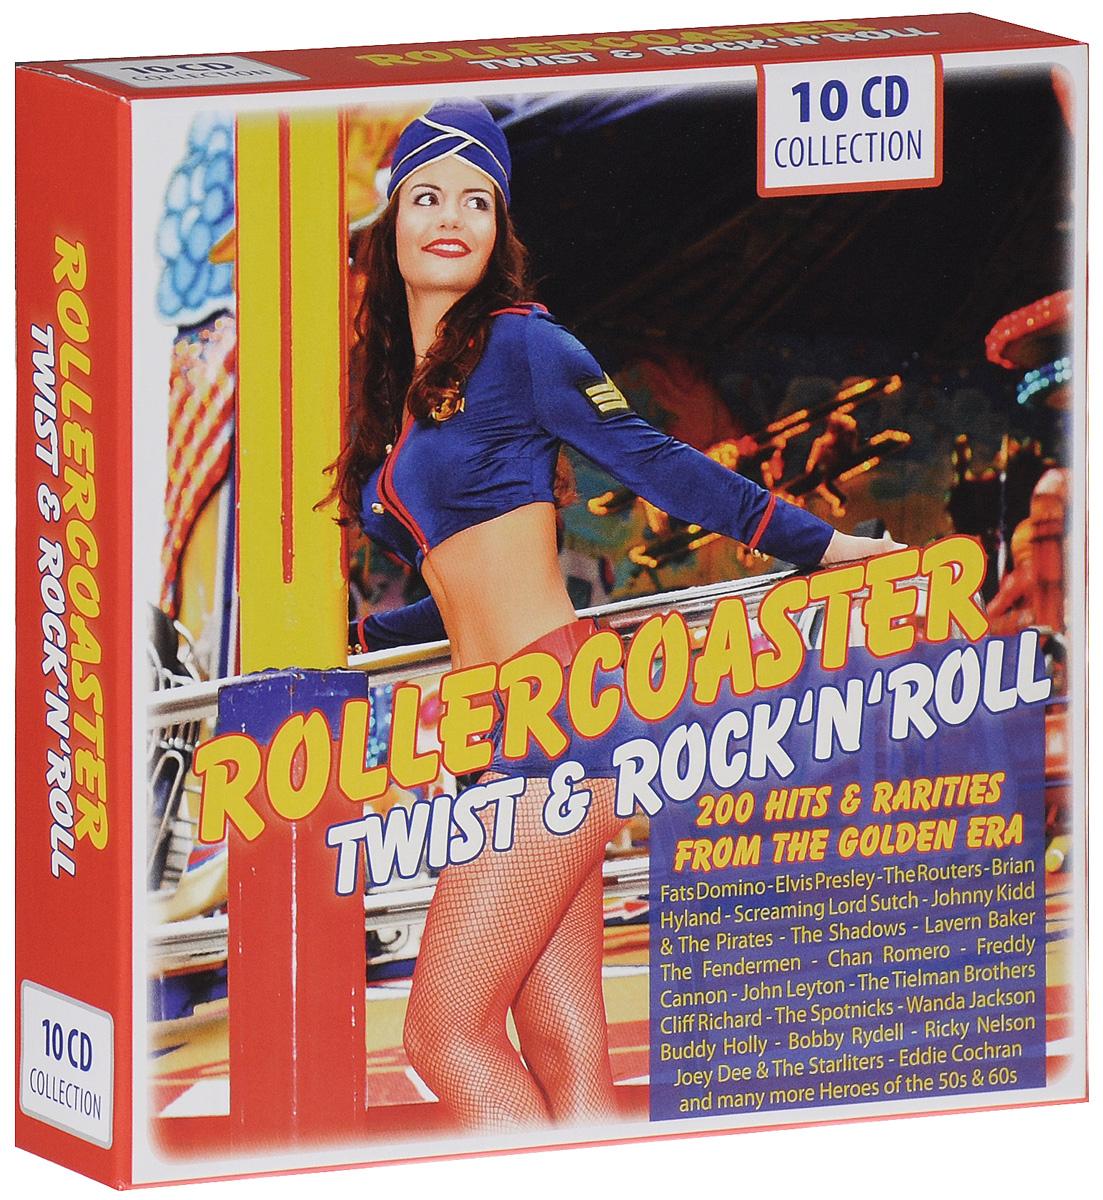 цена на Rollercoaster. Twist & Rock 'N' Roll (10 CD)